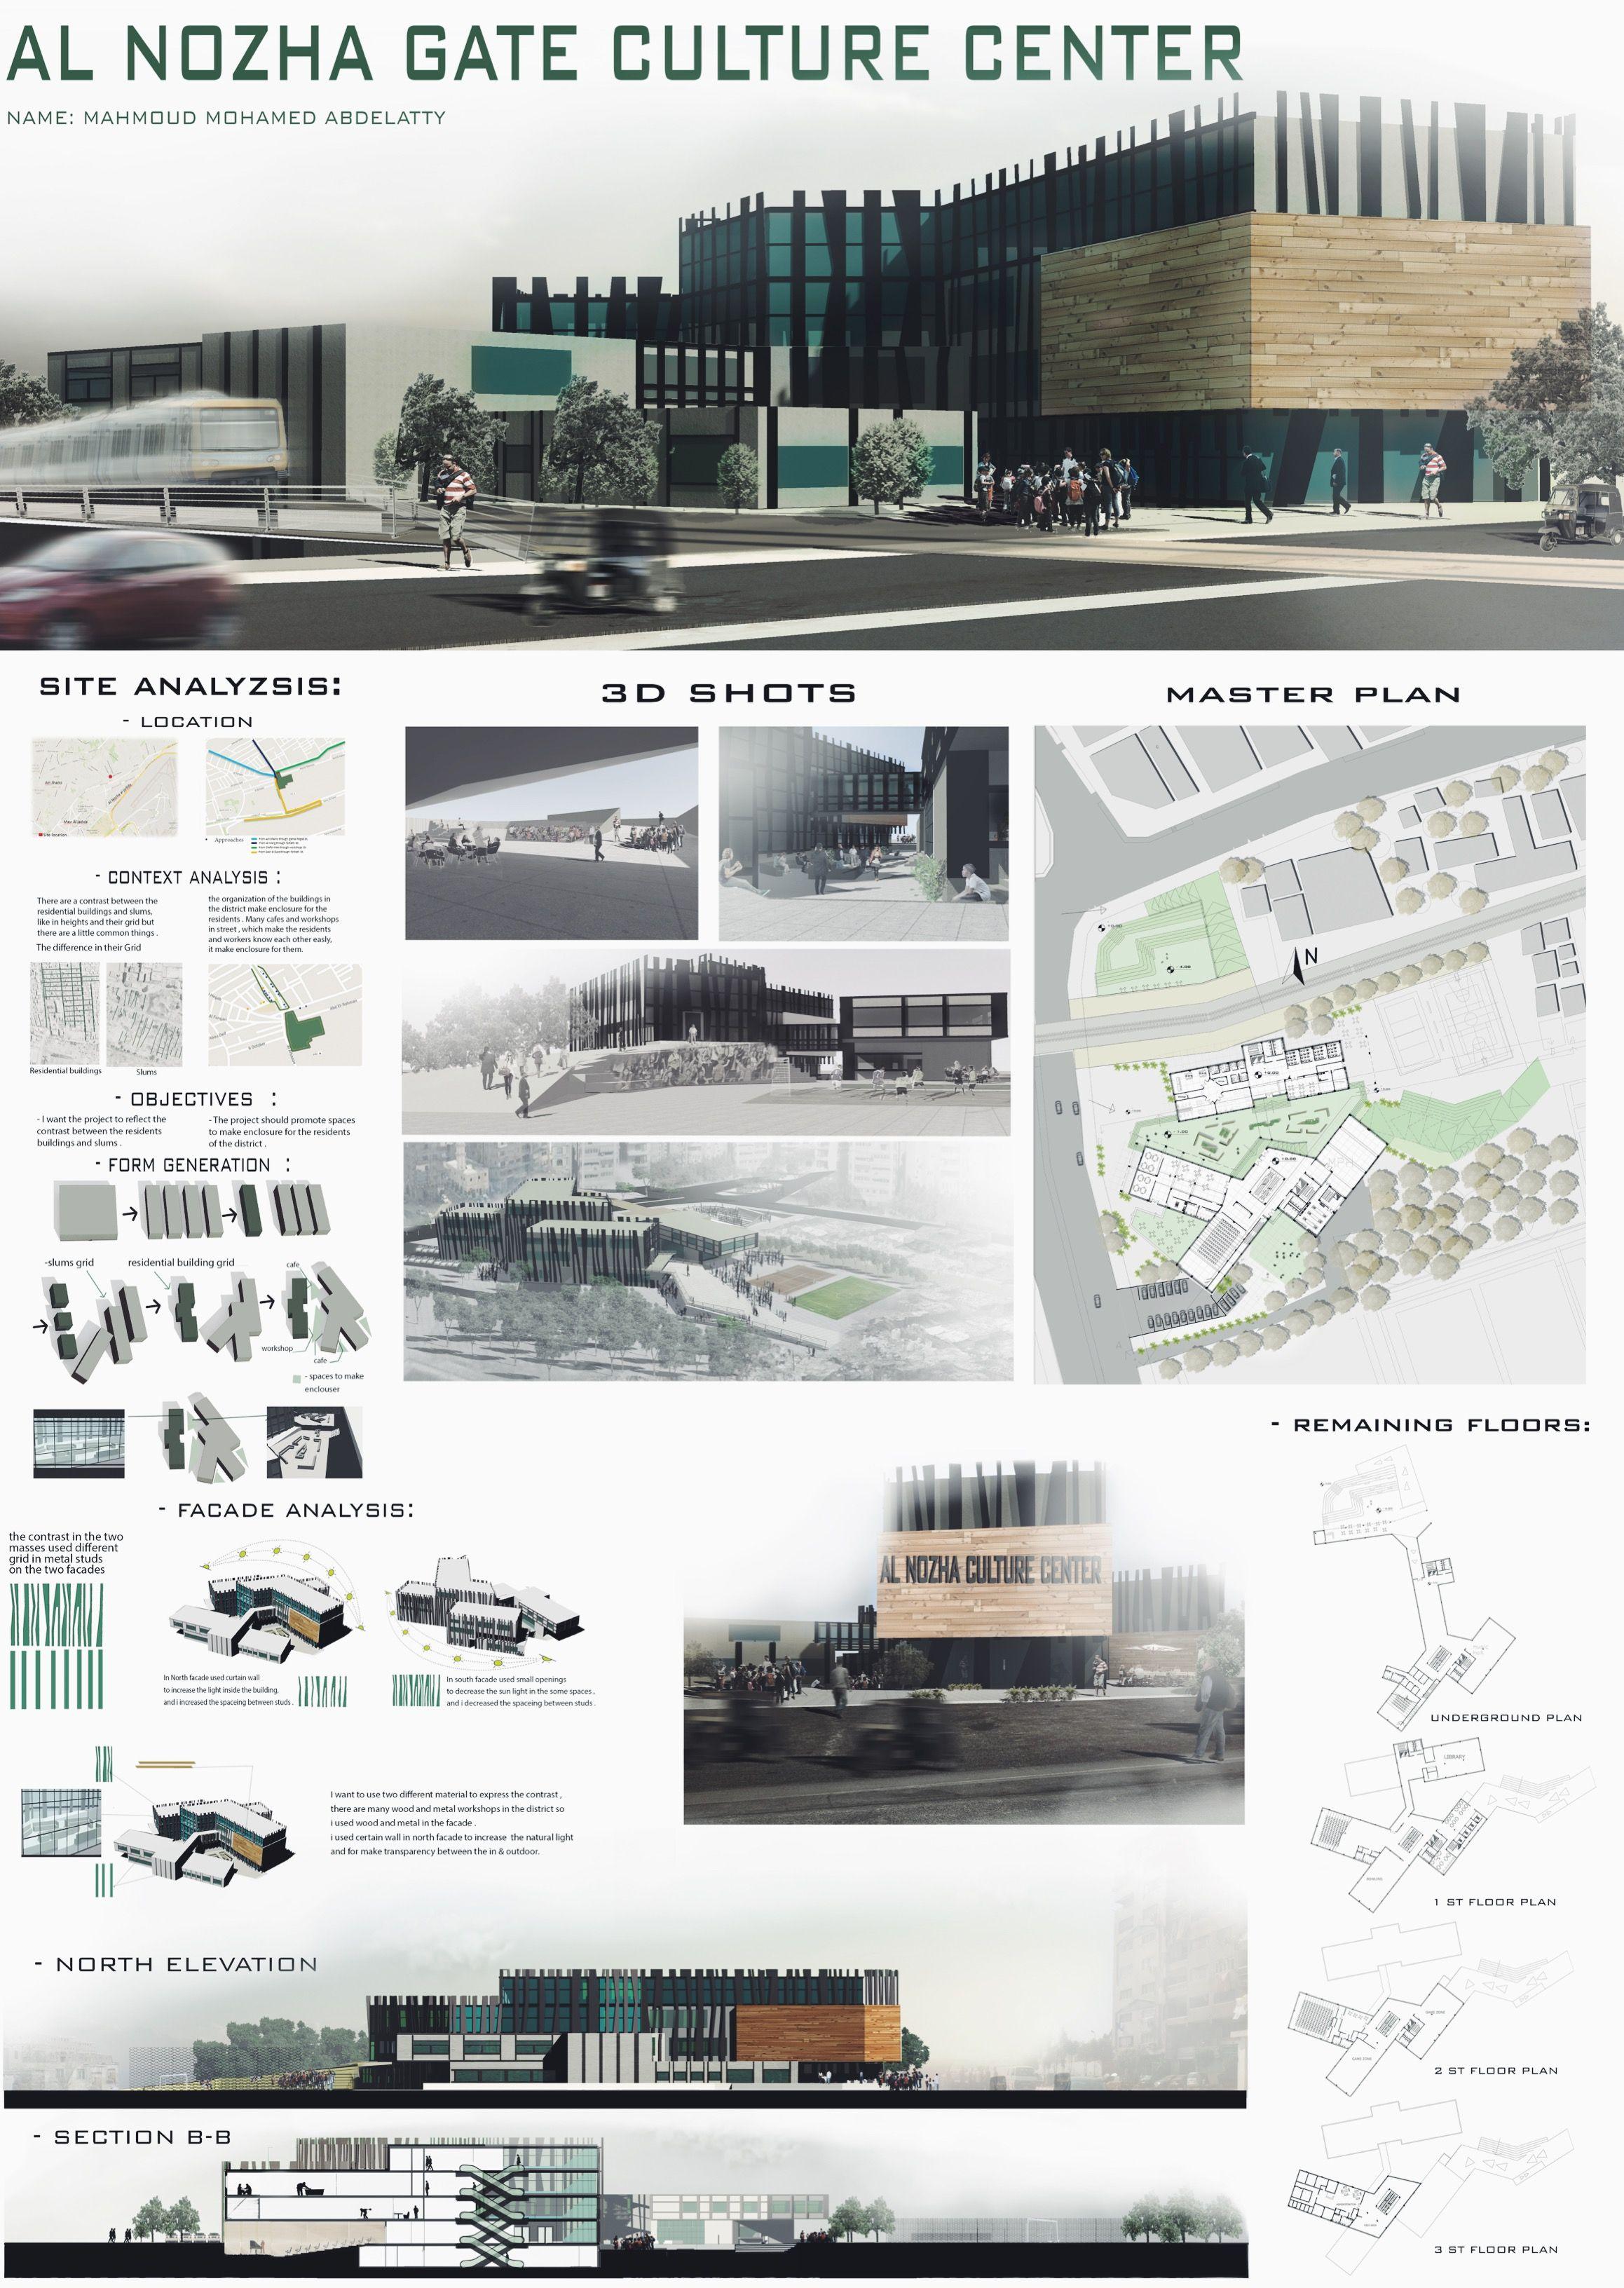 Culture Center Al Nozha Gate Egypt Project Board By Mahmoud